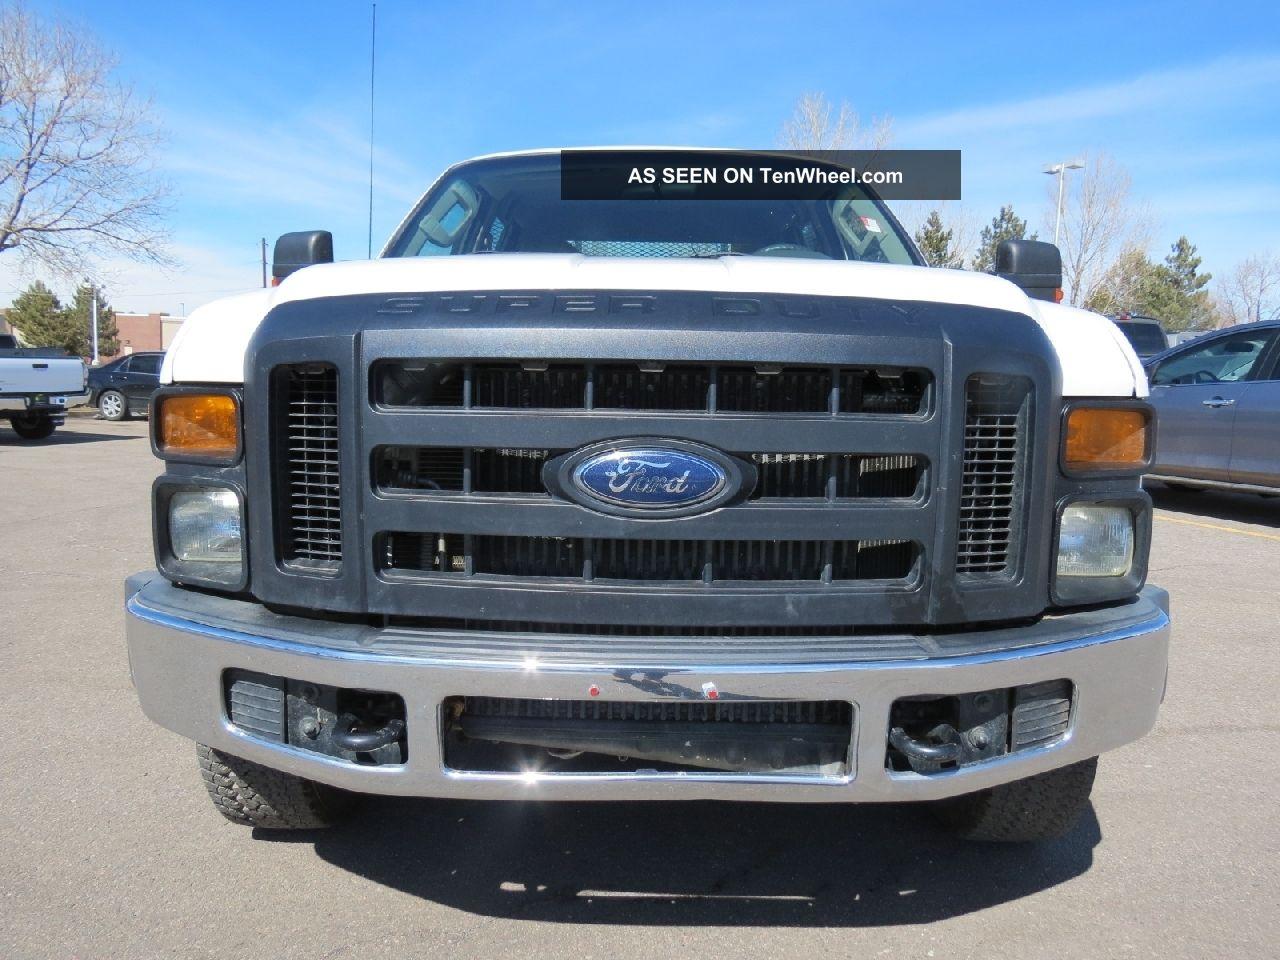 2008 ford f 350 crew cab 4x4 flatbed diesel 4x4 fleet all power runs gr8. Black Bedroom Furniture Sets. Home Design Ideas